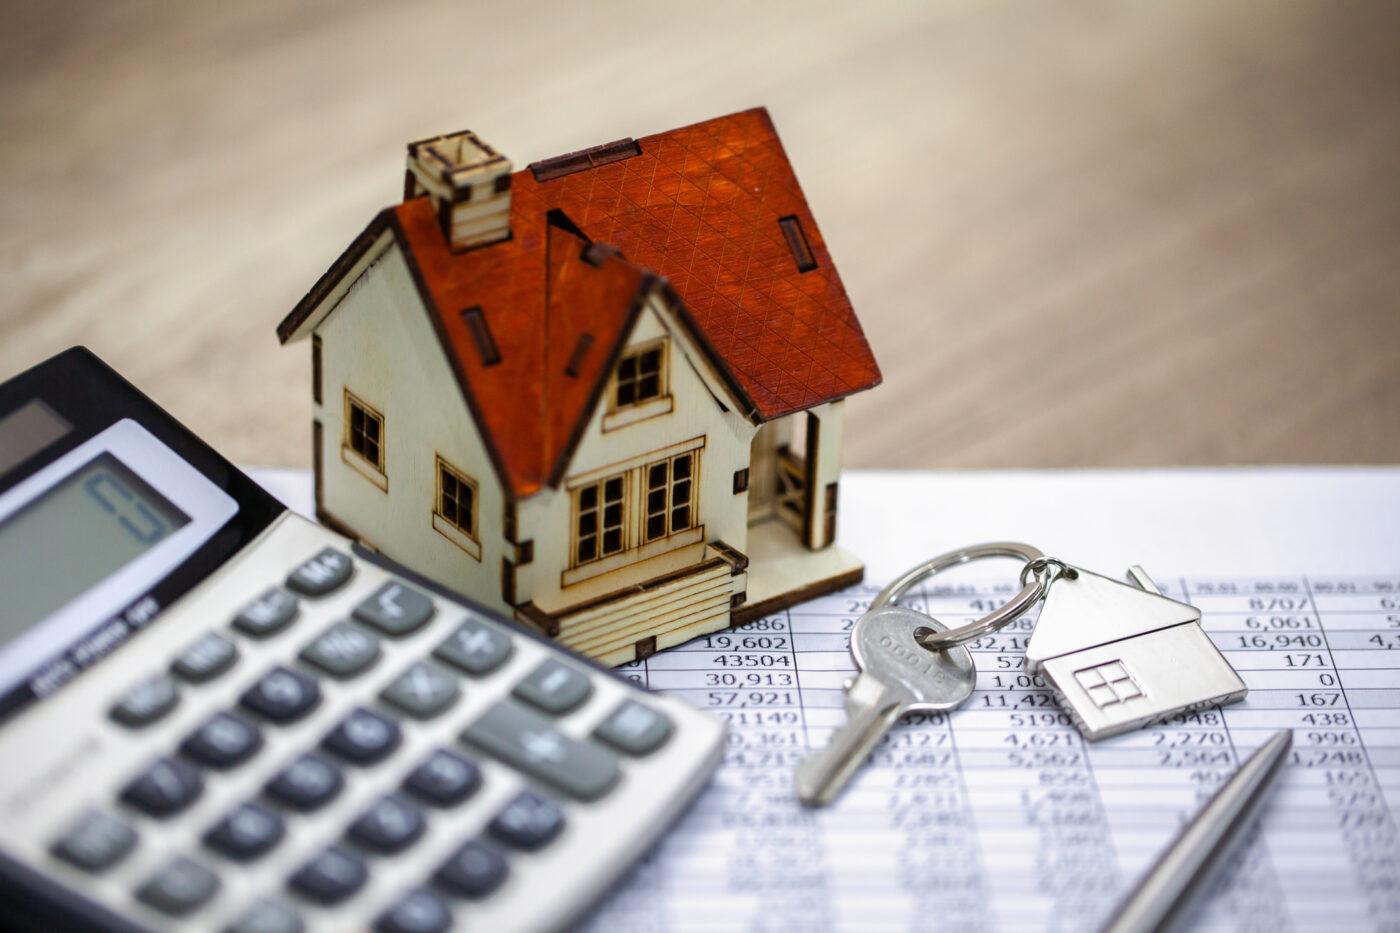 Ocwen is doubling down on PHH Mortgage's loan originations